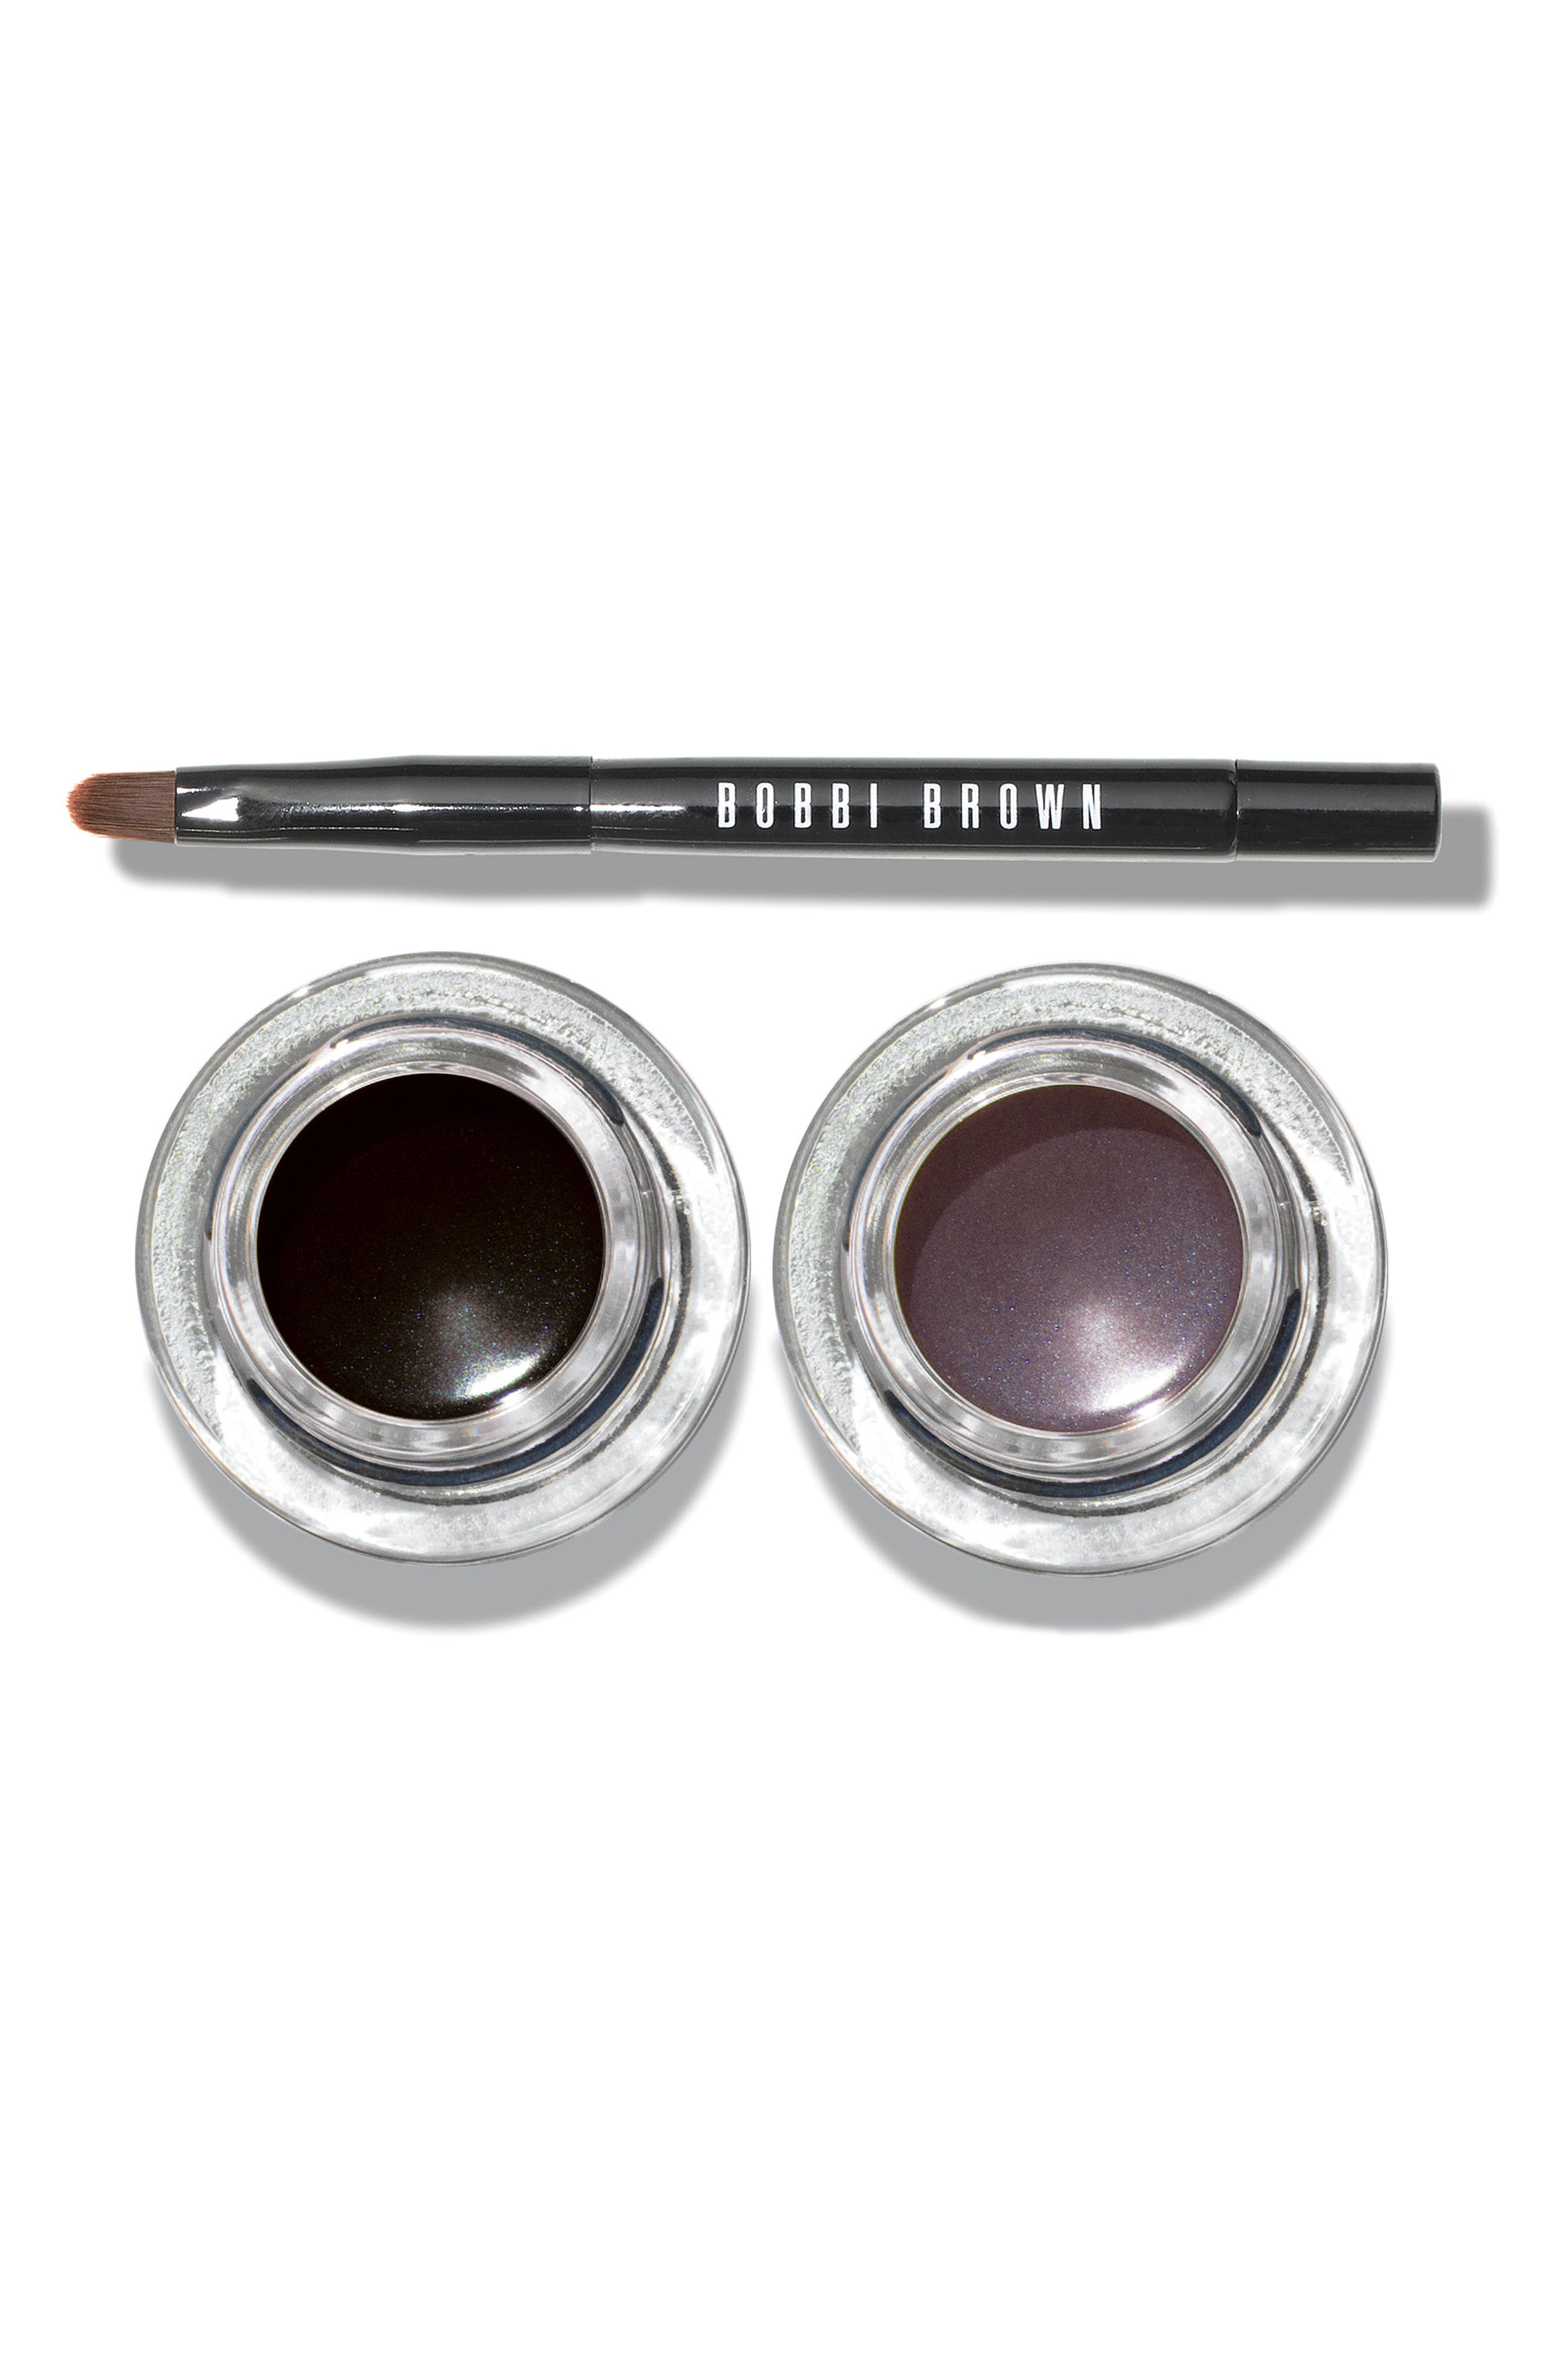 Cat-Eye Long-Wear Gel Eyeliner & Brush Set,                             Main thumbnail 1, color,                             No Color